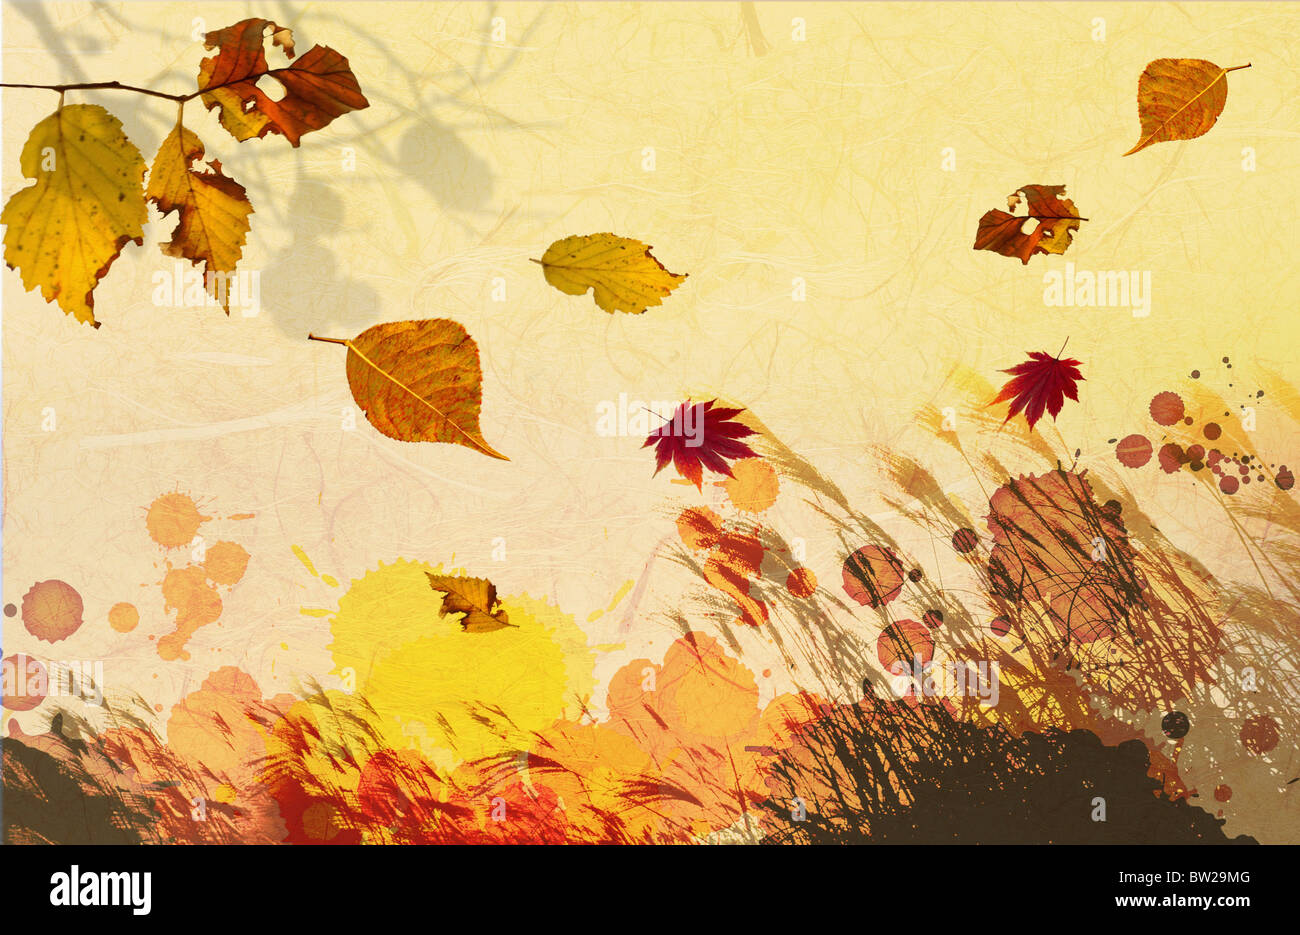 autumn leaves in illustration Stock Photo